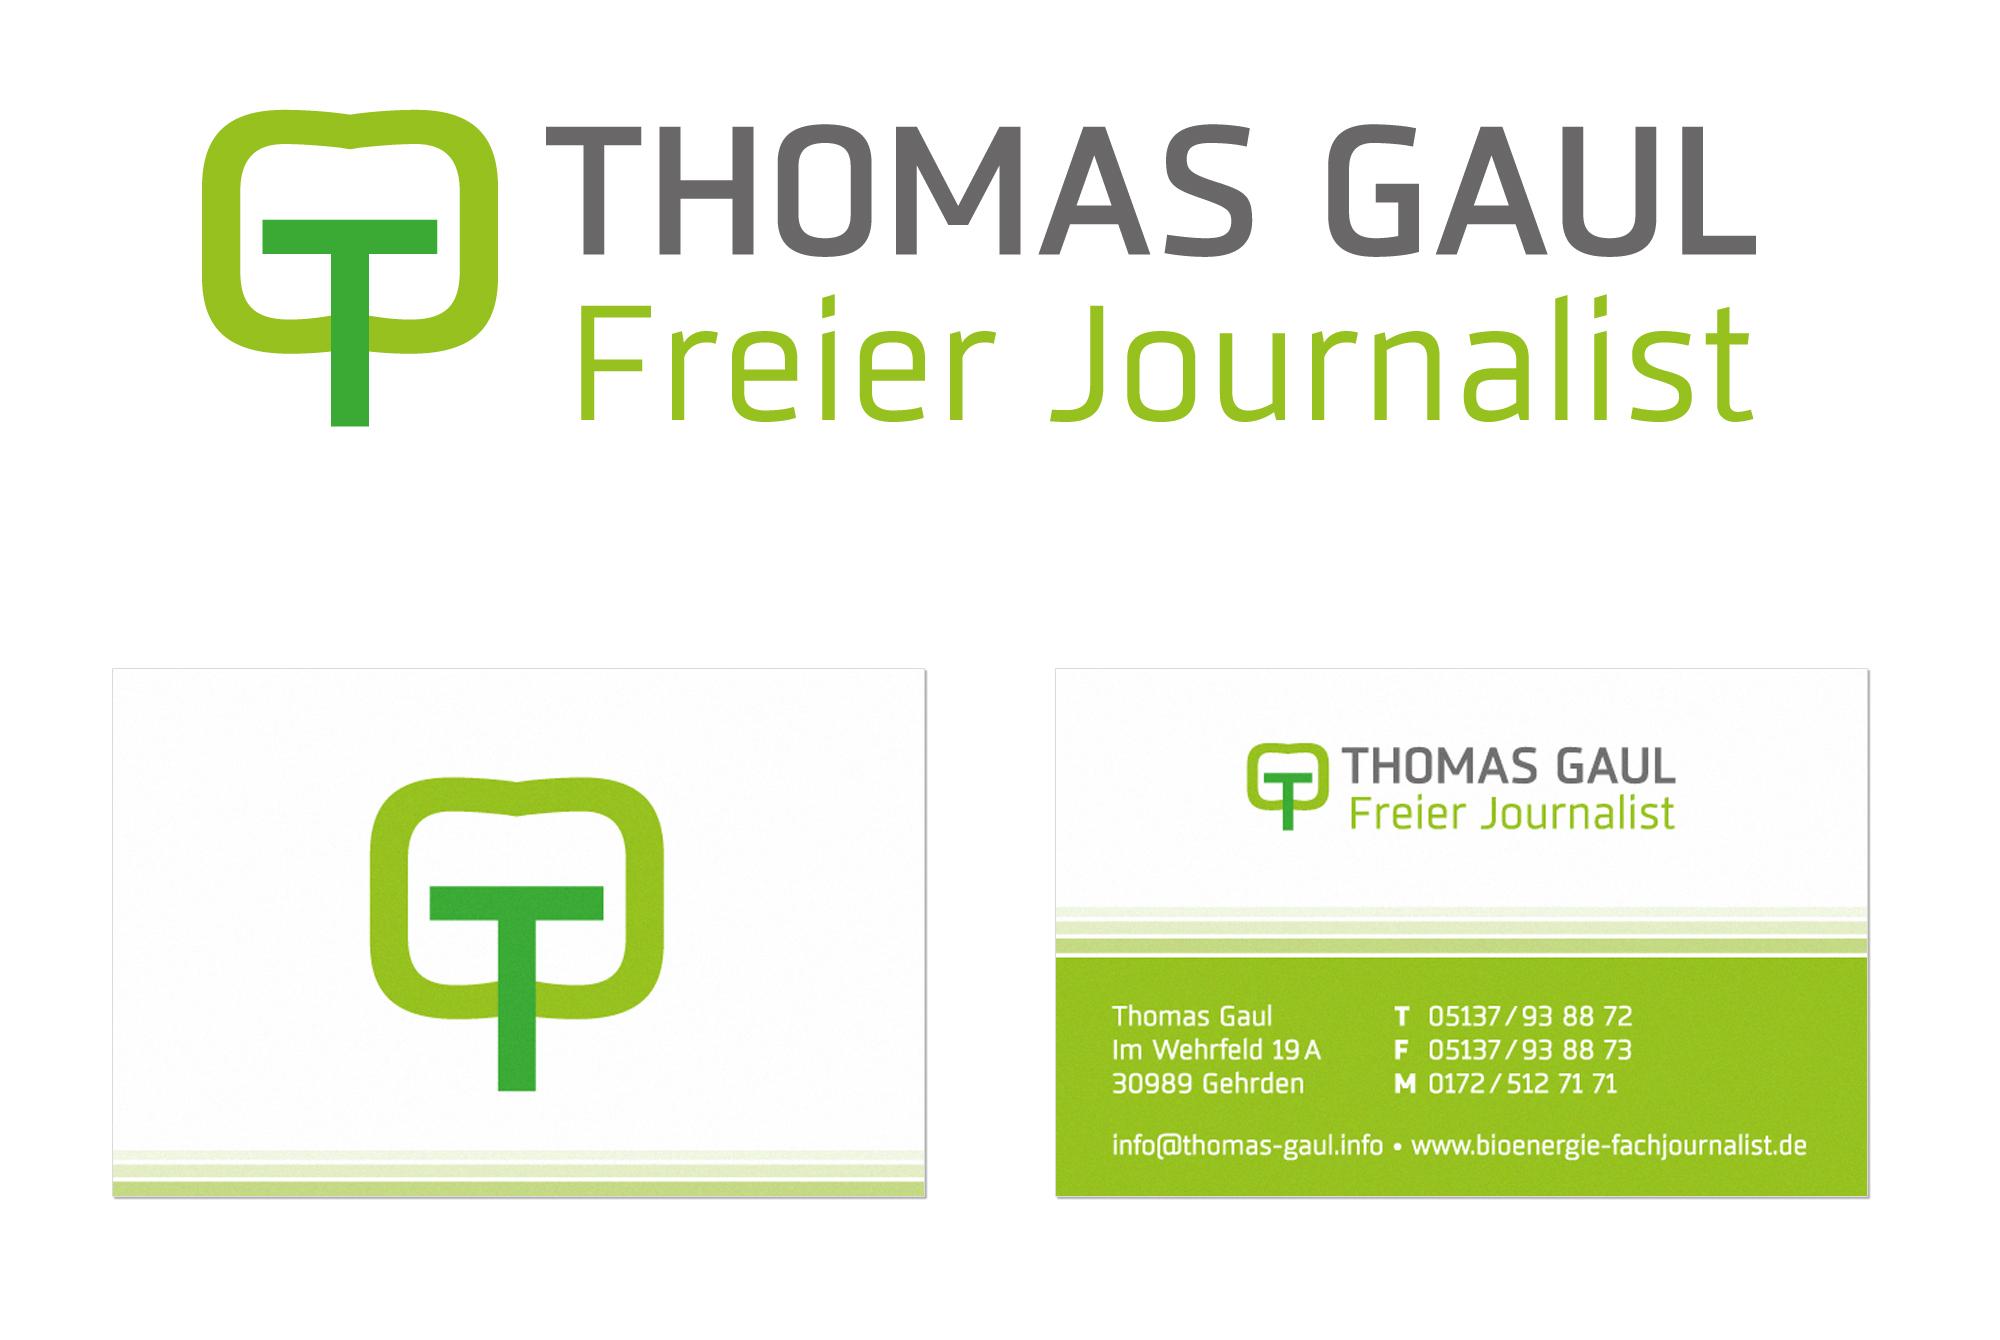 Thomas Gaul – freier Journalist